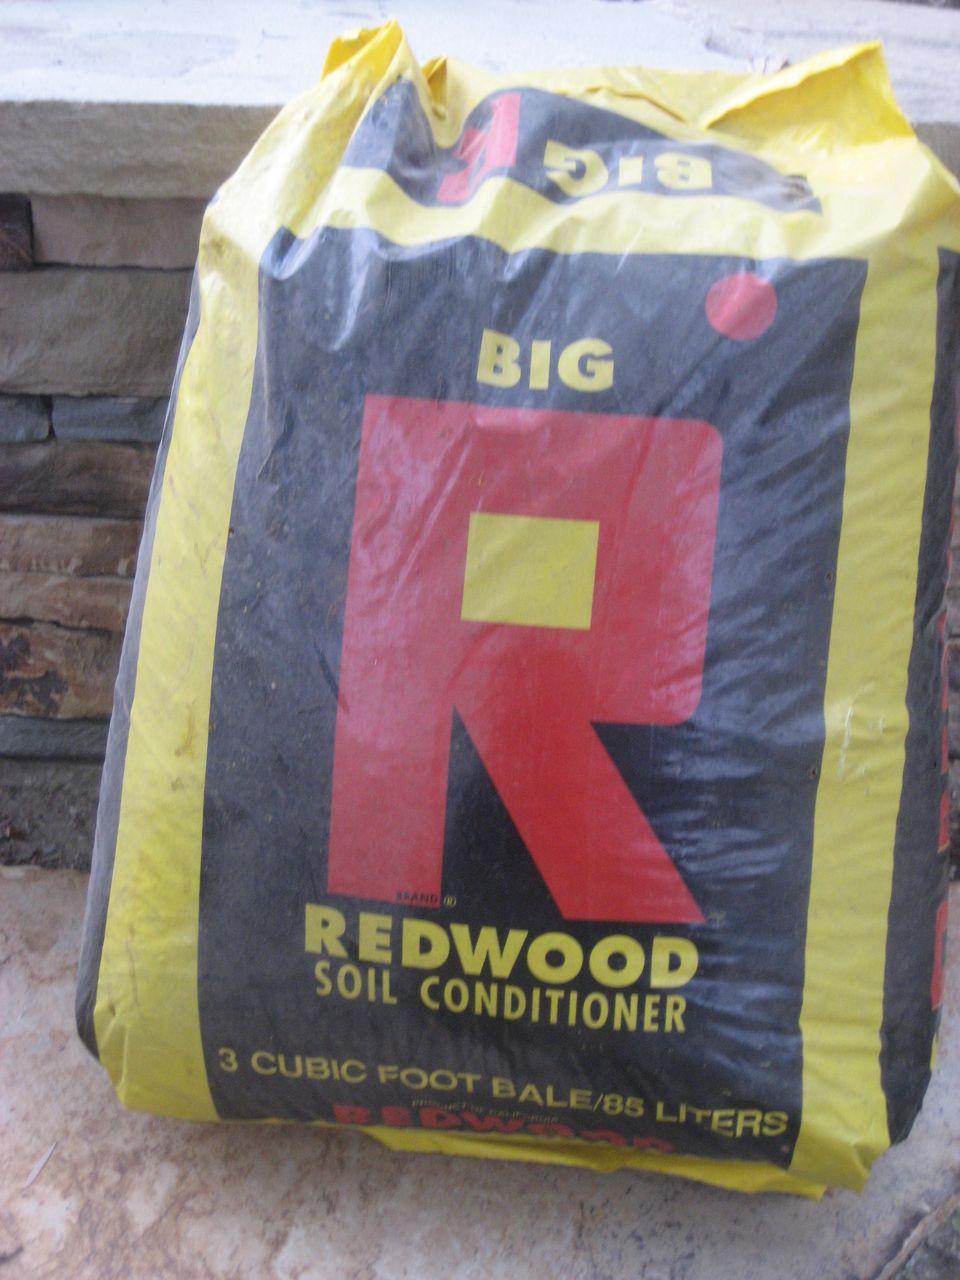 redwood soil conditioner mulch